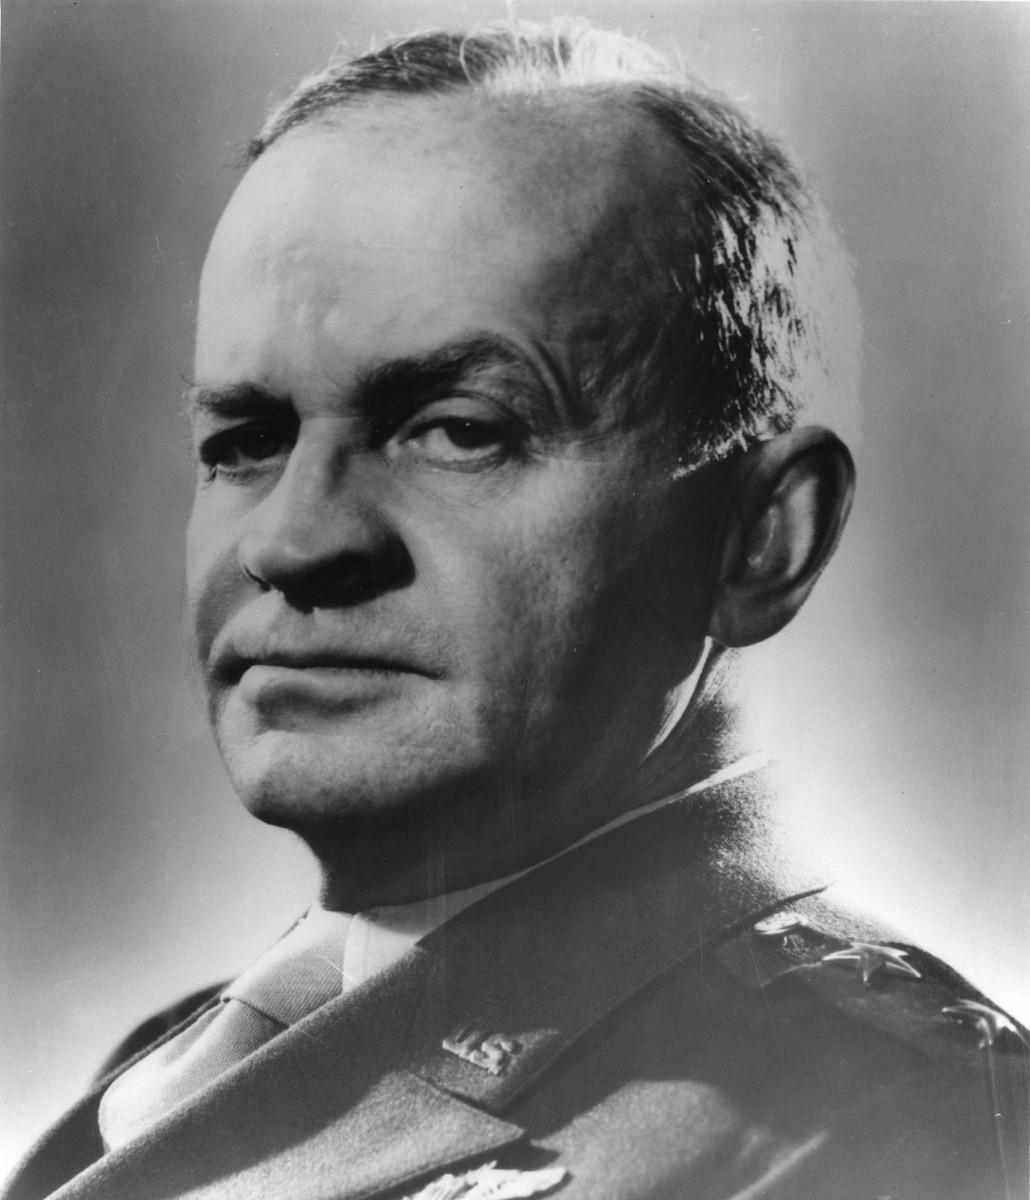 Maj. Gen. Davenport Johnson